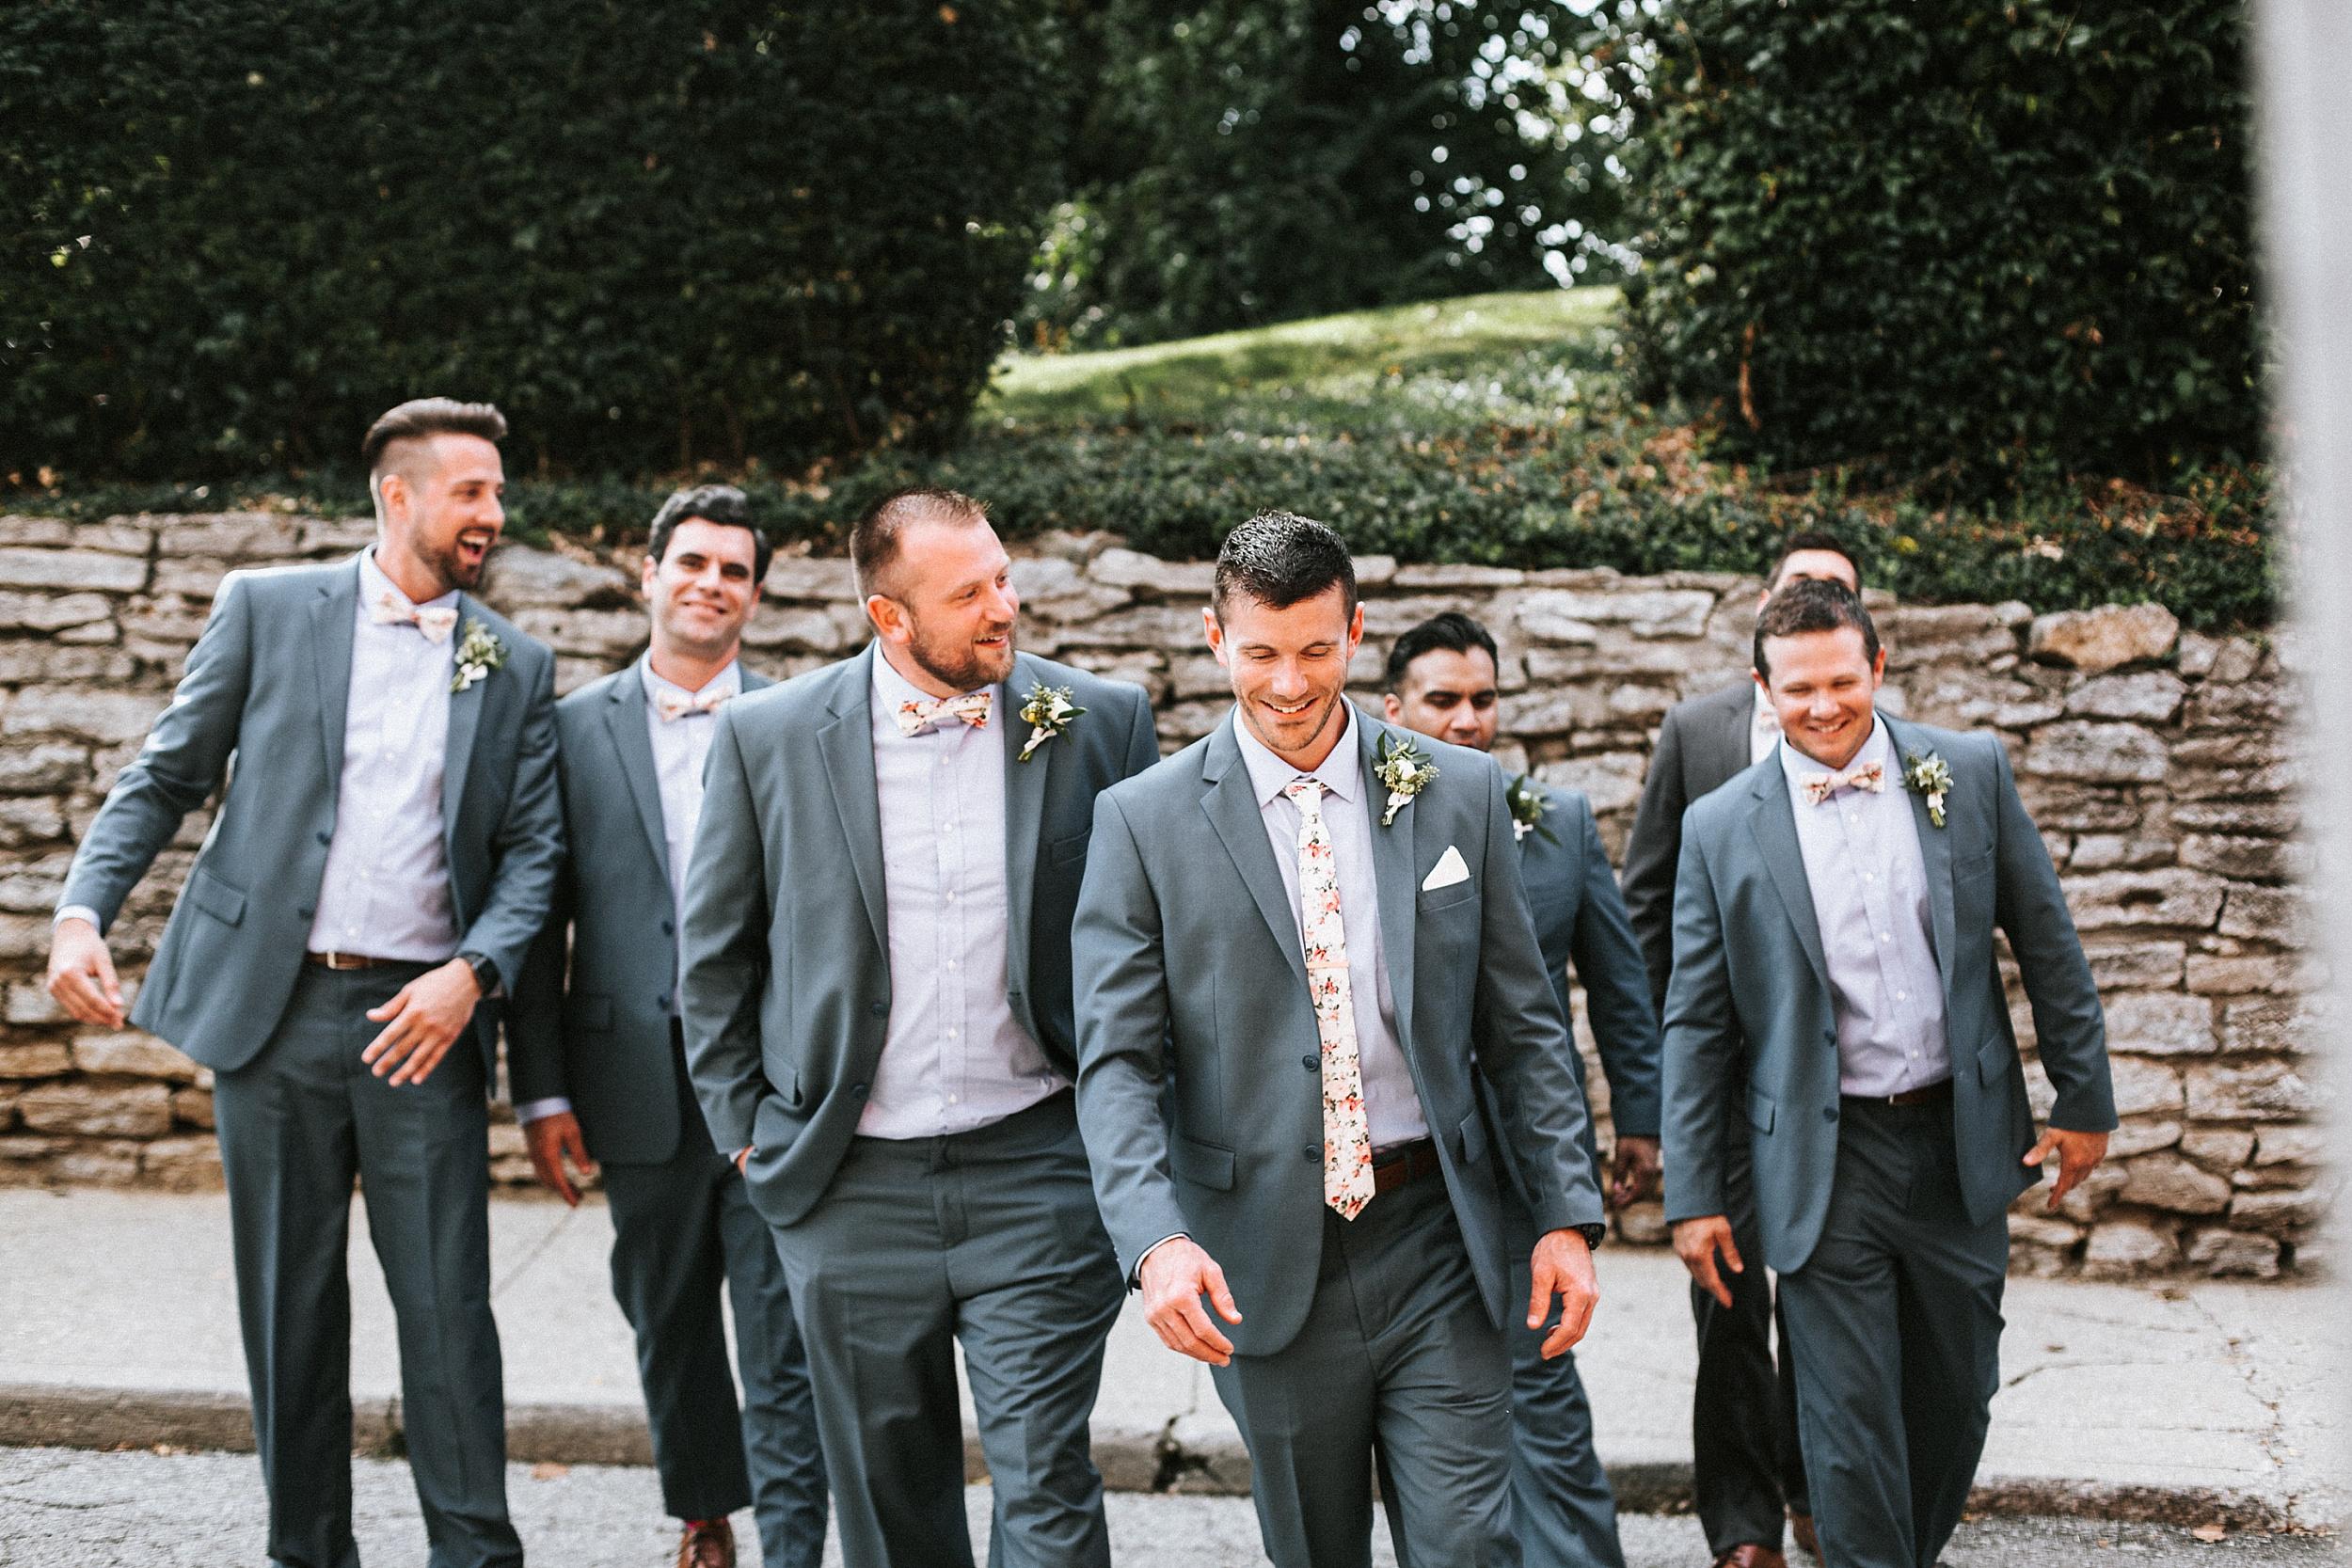 Brooke Townsend Photography - Cincinnati Wedding Photographer (69 of 170).jpg